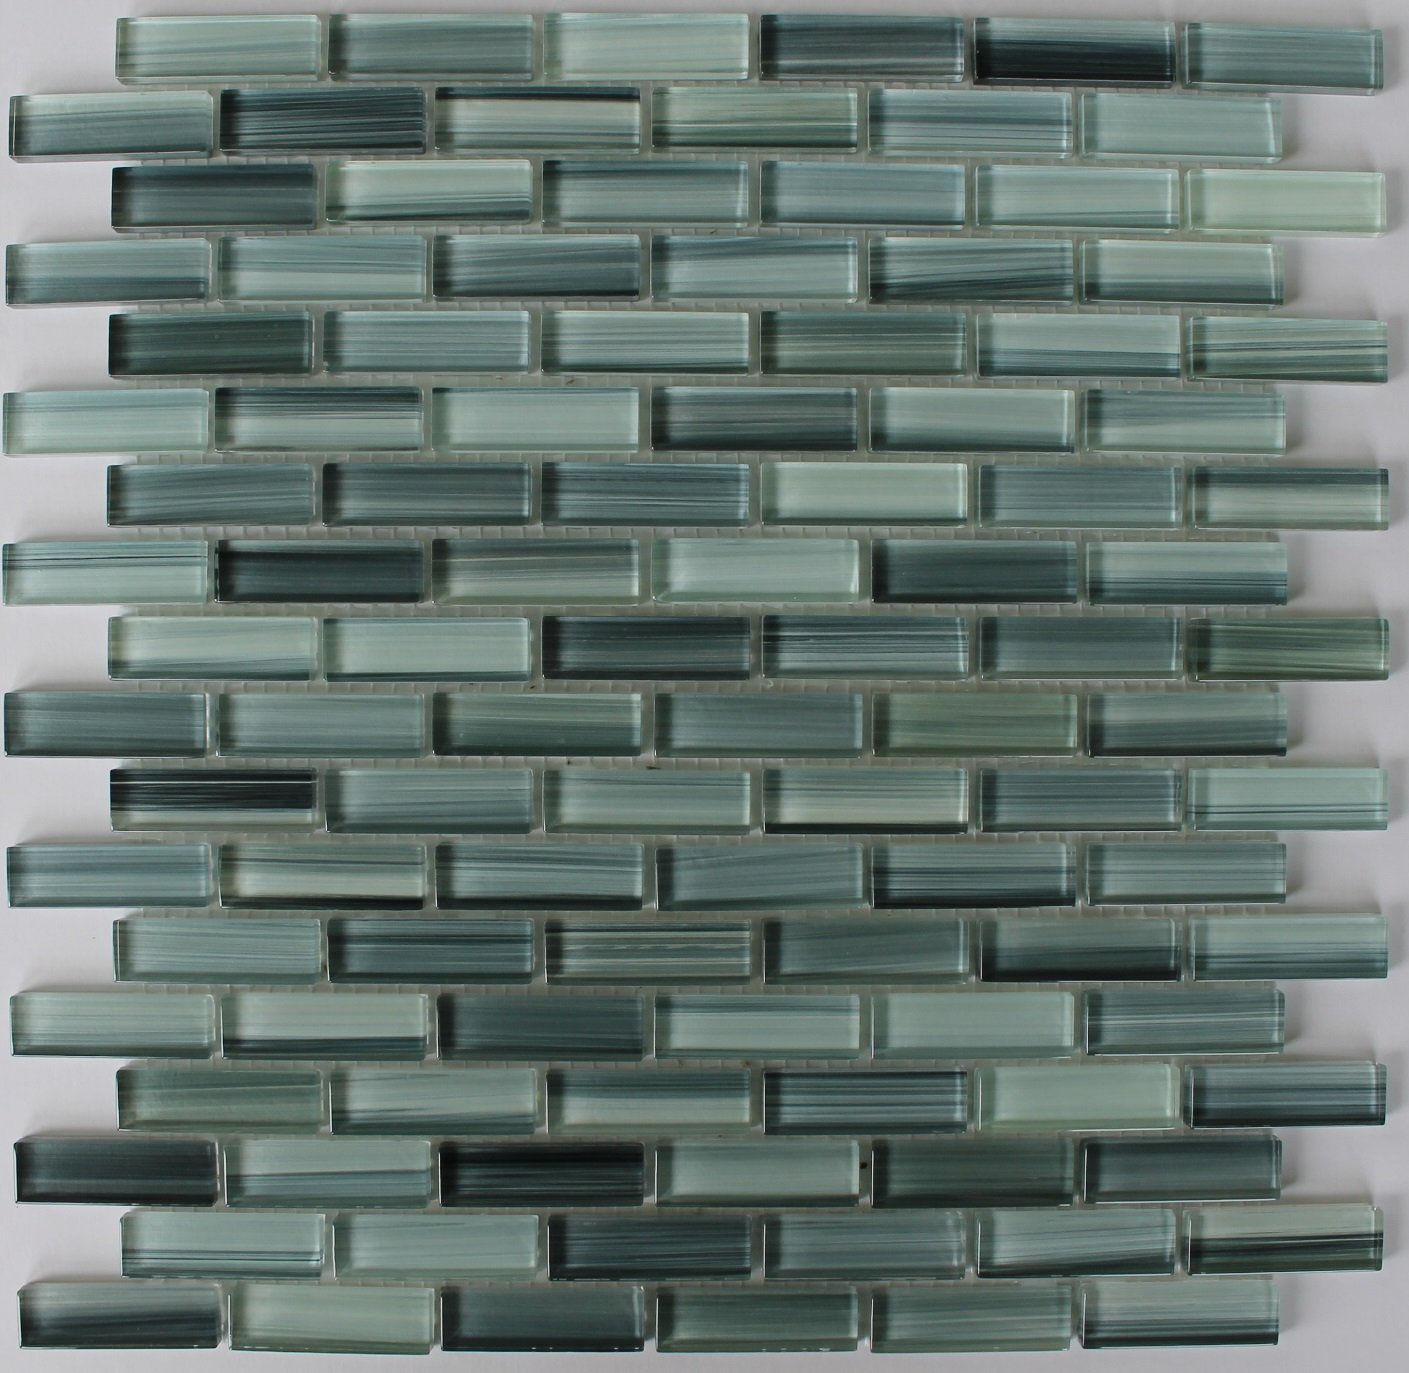 10 Sq Ft - Surfz Up Aqua Blue Grey Hand Painted Glass Mosaic Subway Tiles for Bathroom Walls or Kitchen Backsplash